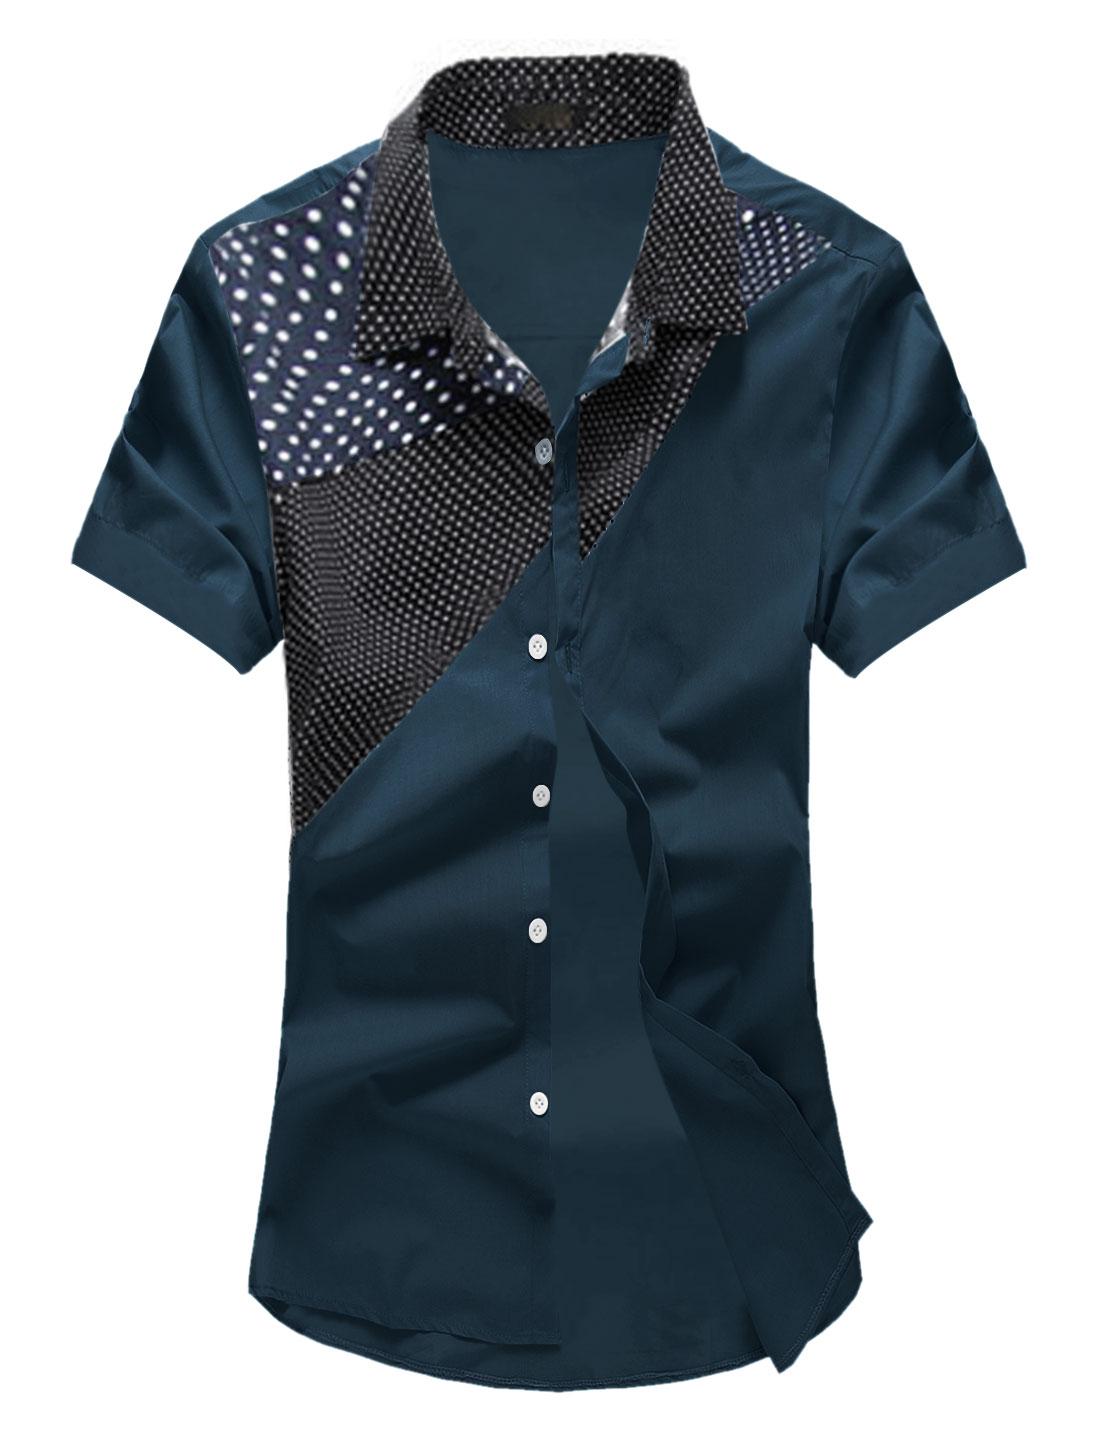 Men Dots Prints Point Collar Short Sleeves Panel Casual Shirt Navy Blue M